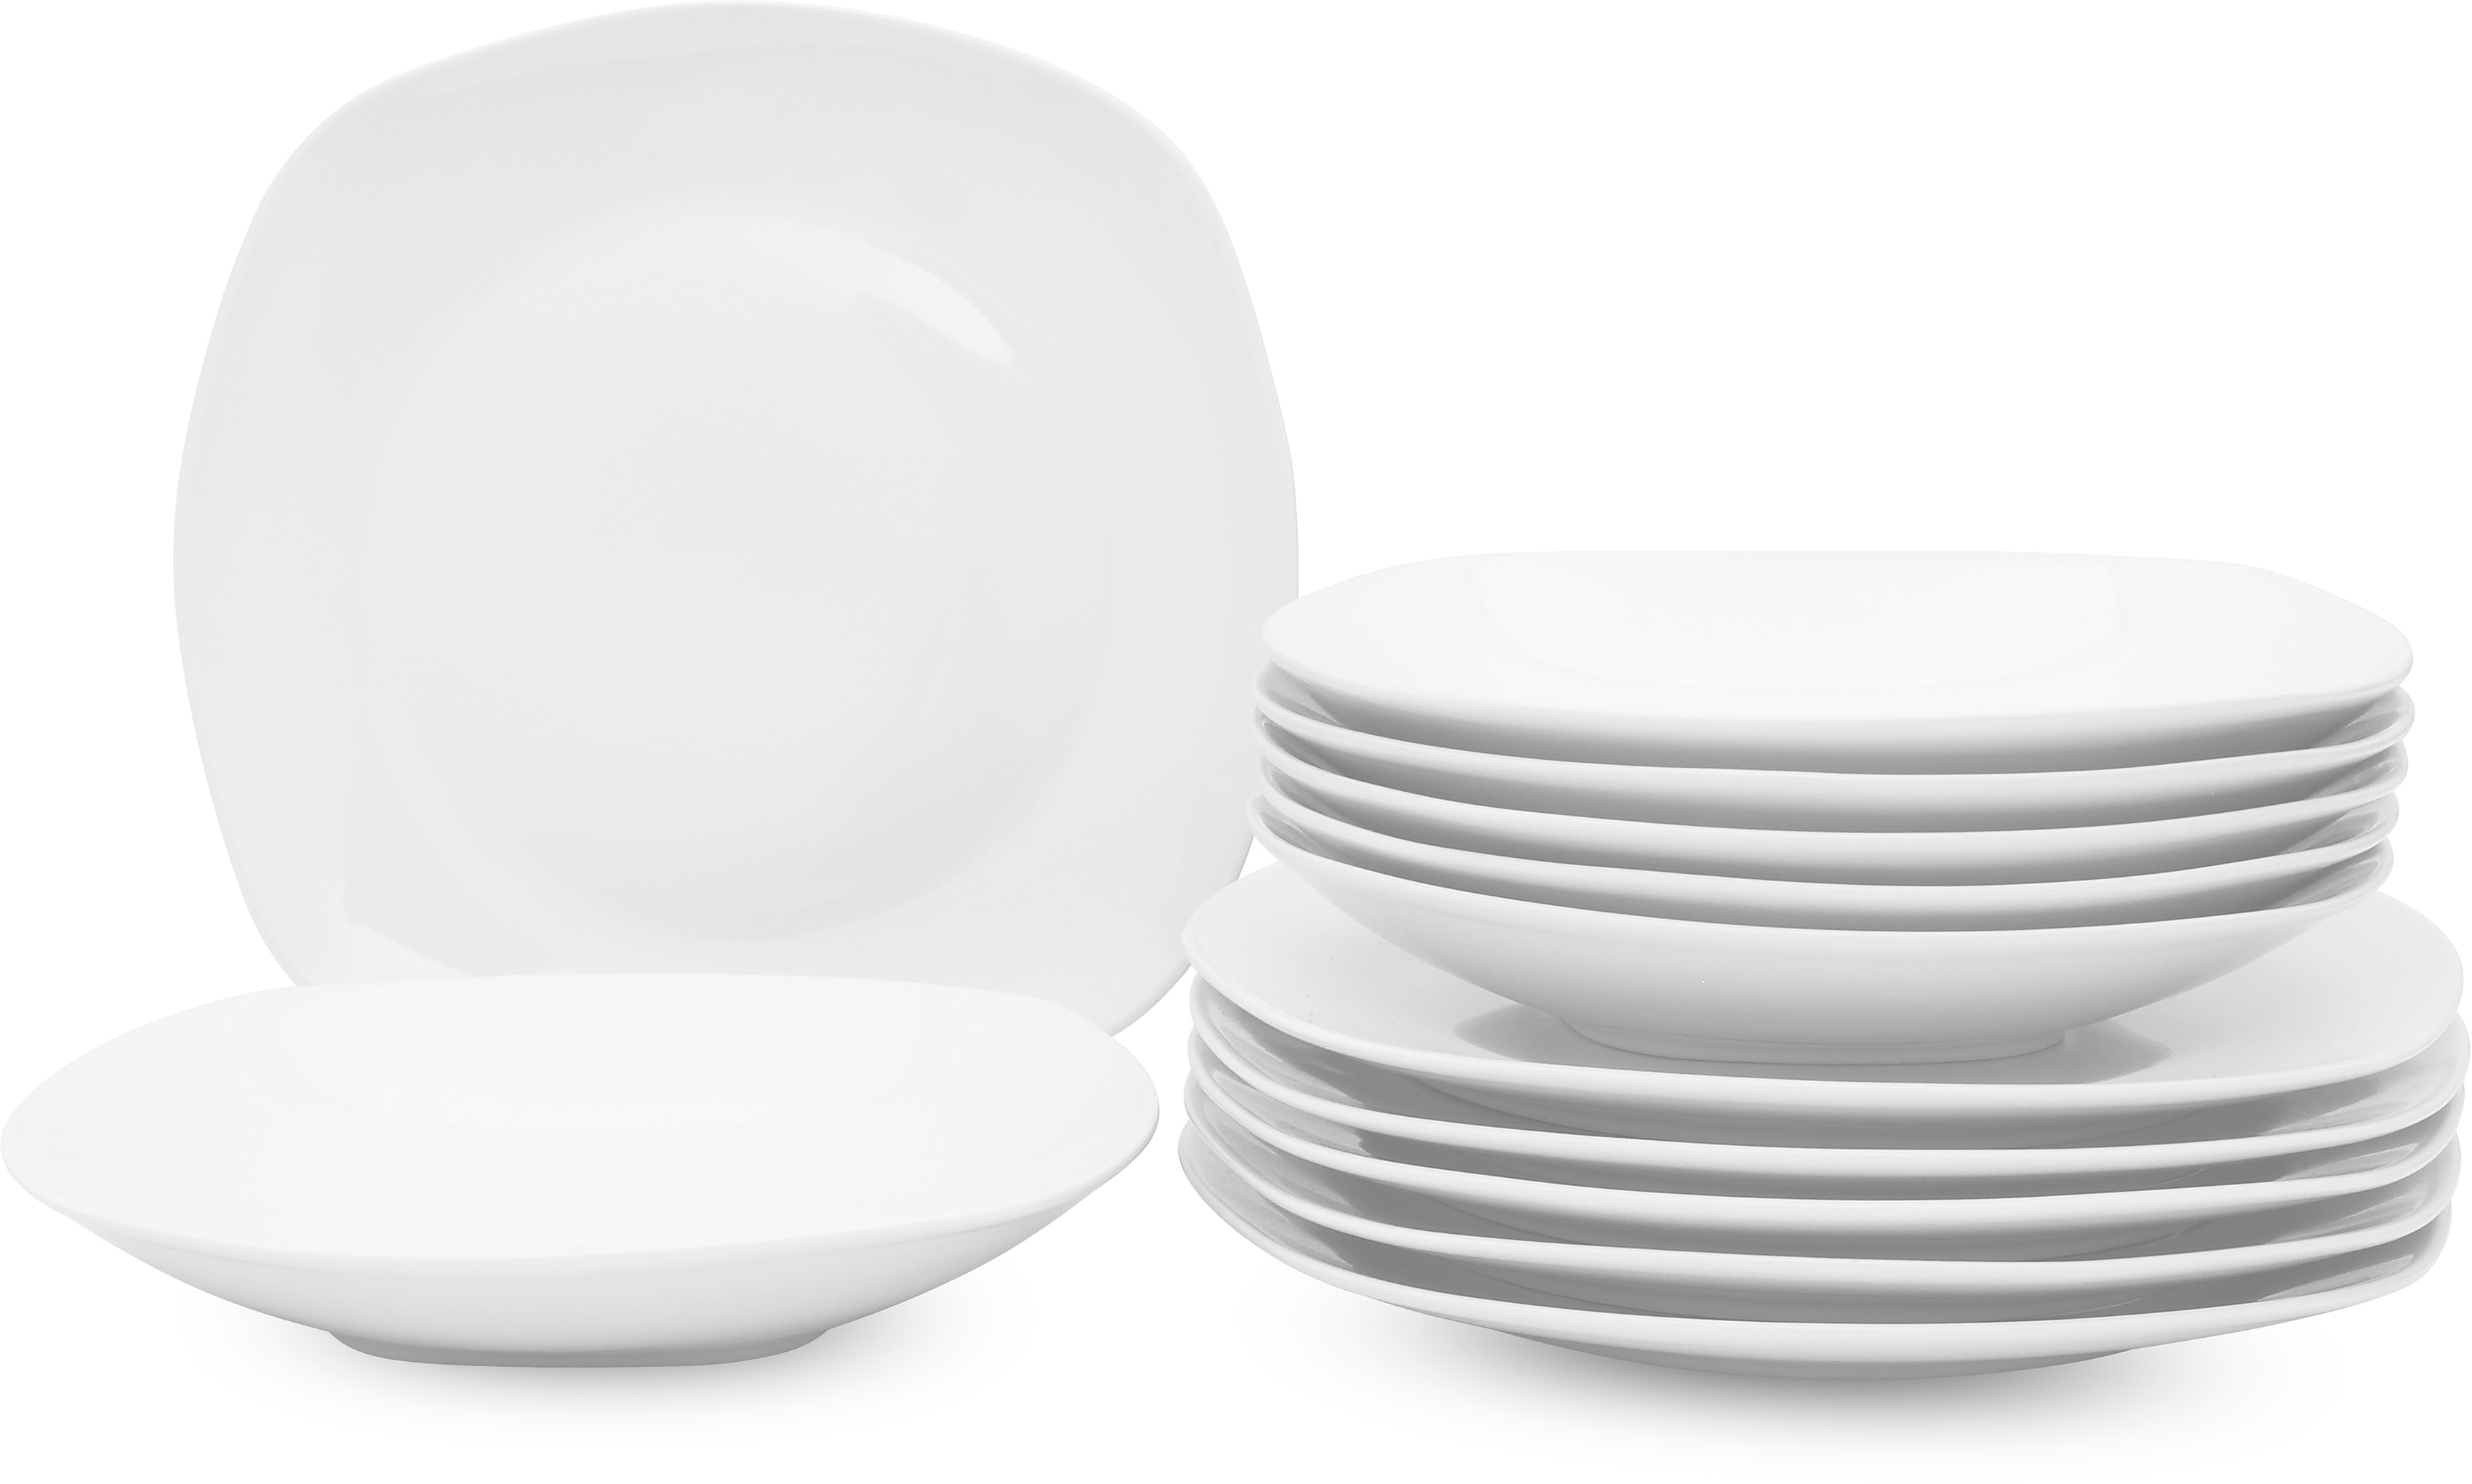 Retsch Arzberg Tafelservice Fino, (12 tlg.) weiß Geschirr-Sets Geschirr, Porzellan Tischaccessoires Haushaltswaren